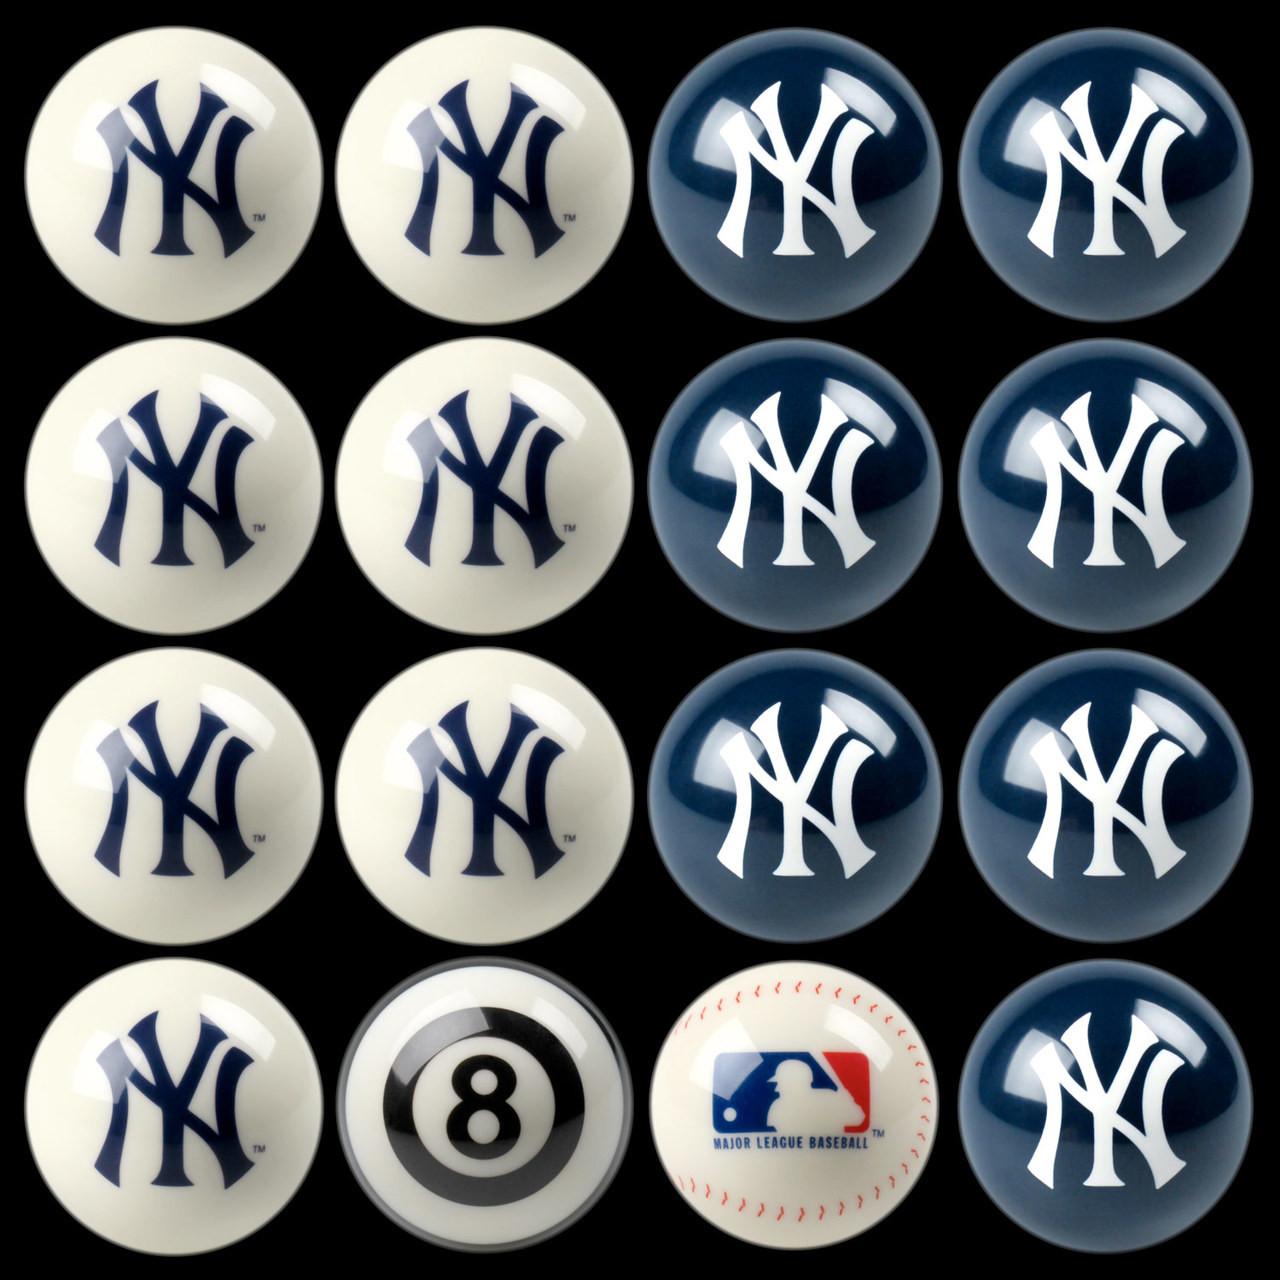 Ny yankees pool balls cuesight ny yankees pool balls biocorpaavc Images